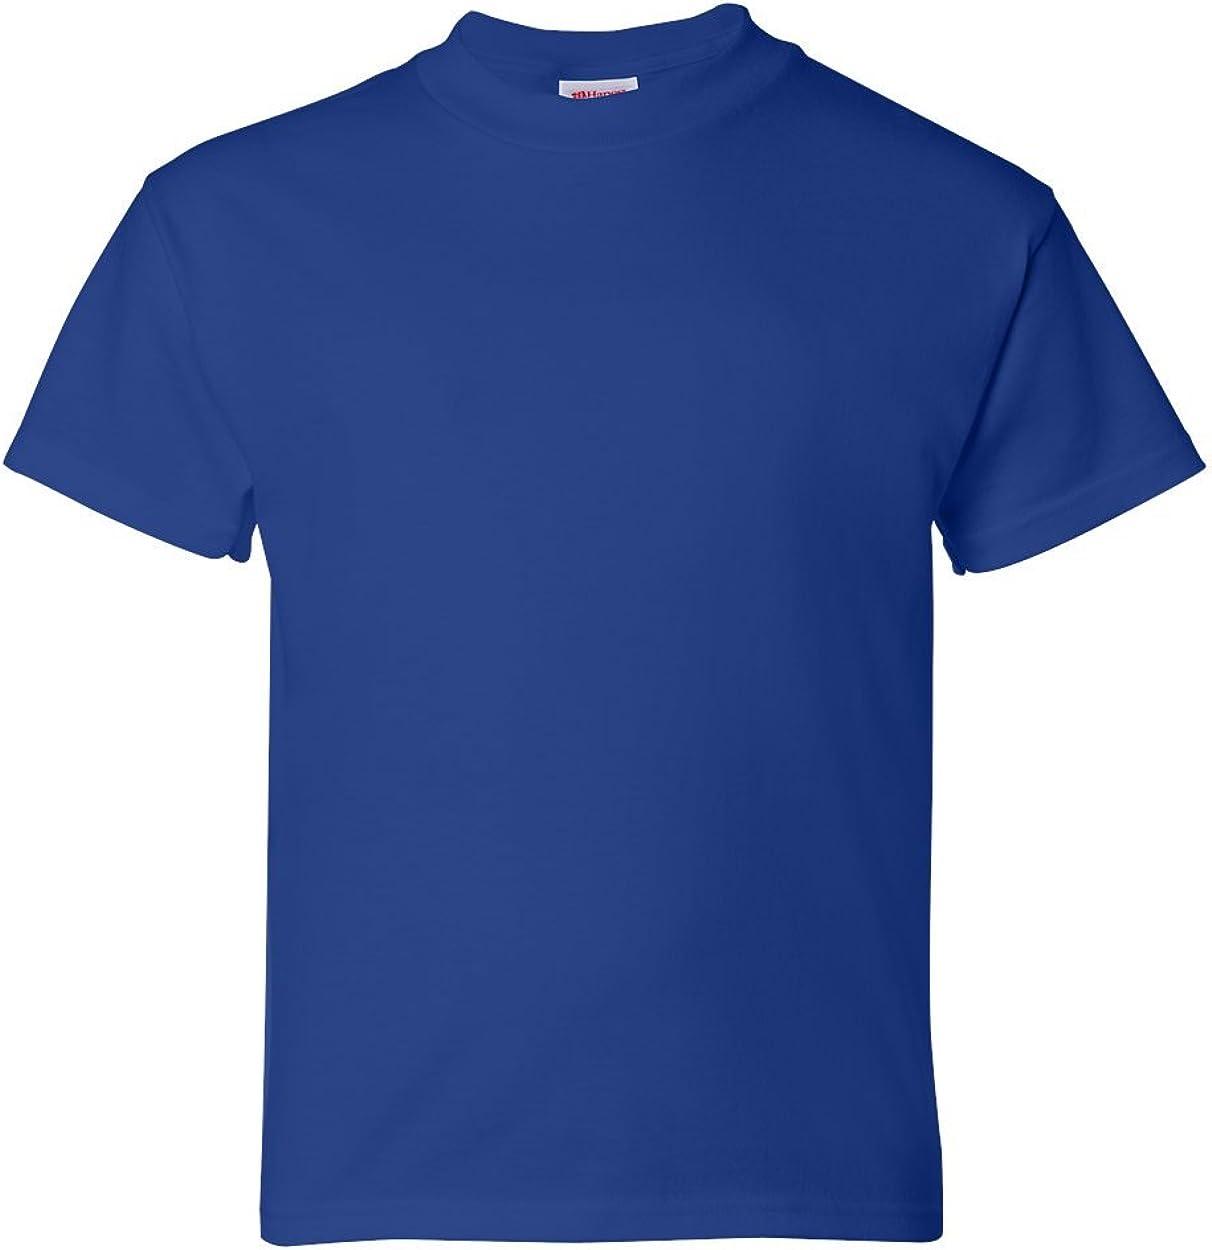 Hanes Boys 5.2 oz. ComfortSoft Cotton T-Shirt 5480 -DEEP ROYAL XL